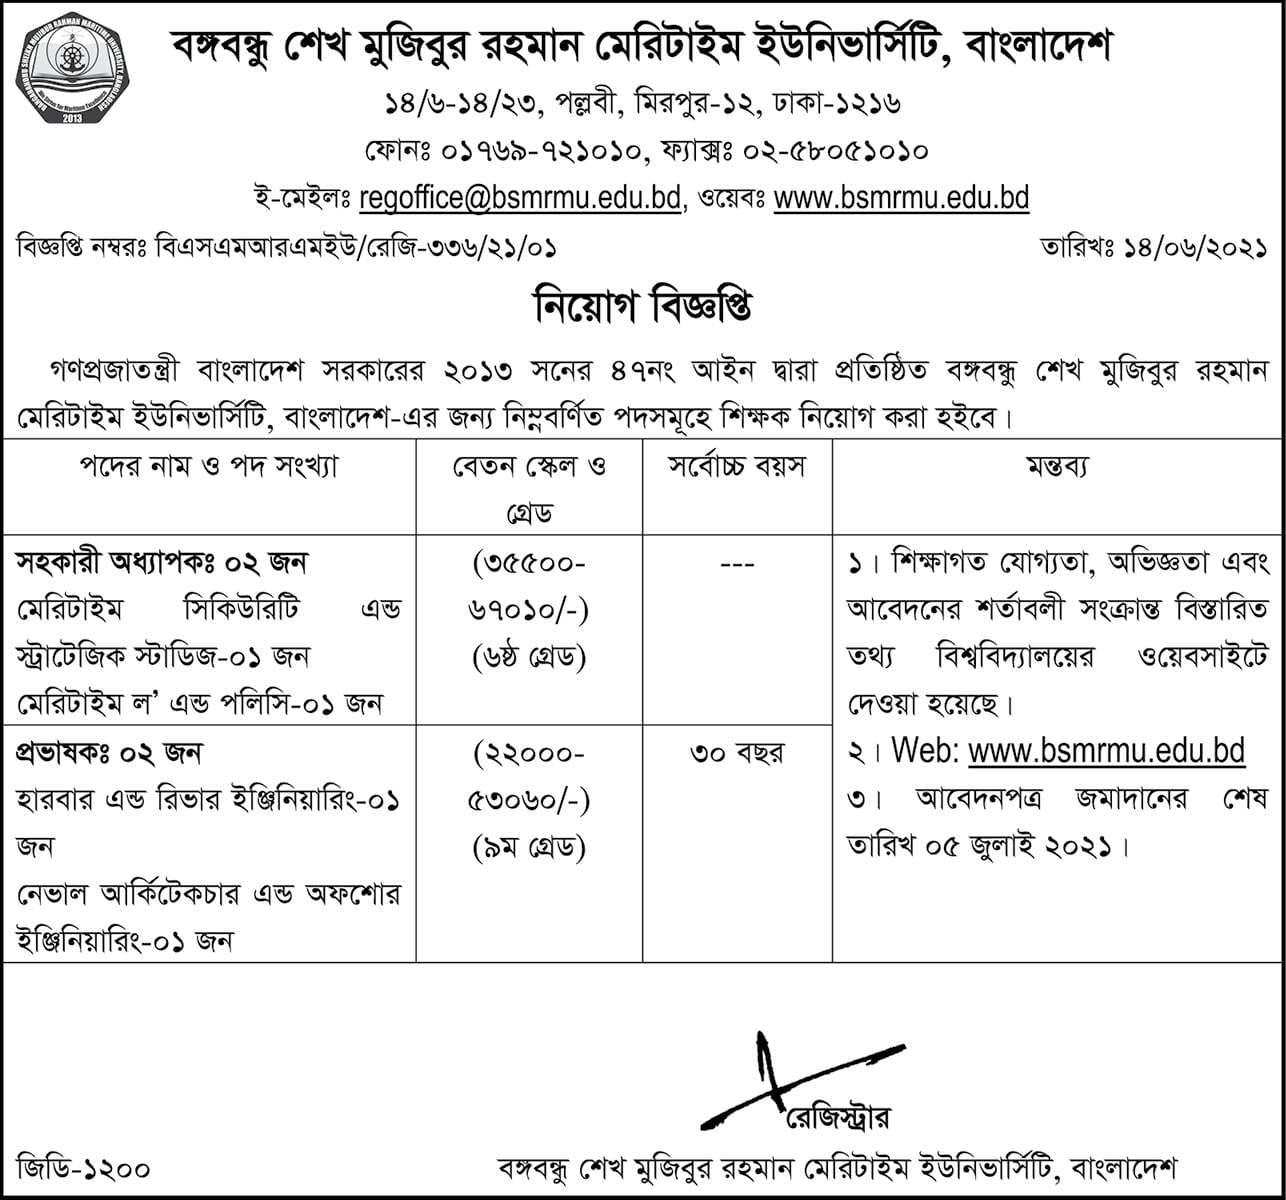 BSMRMU Job Circular 2021